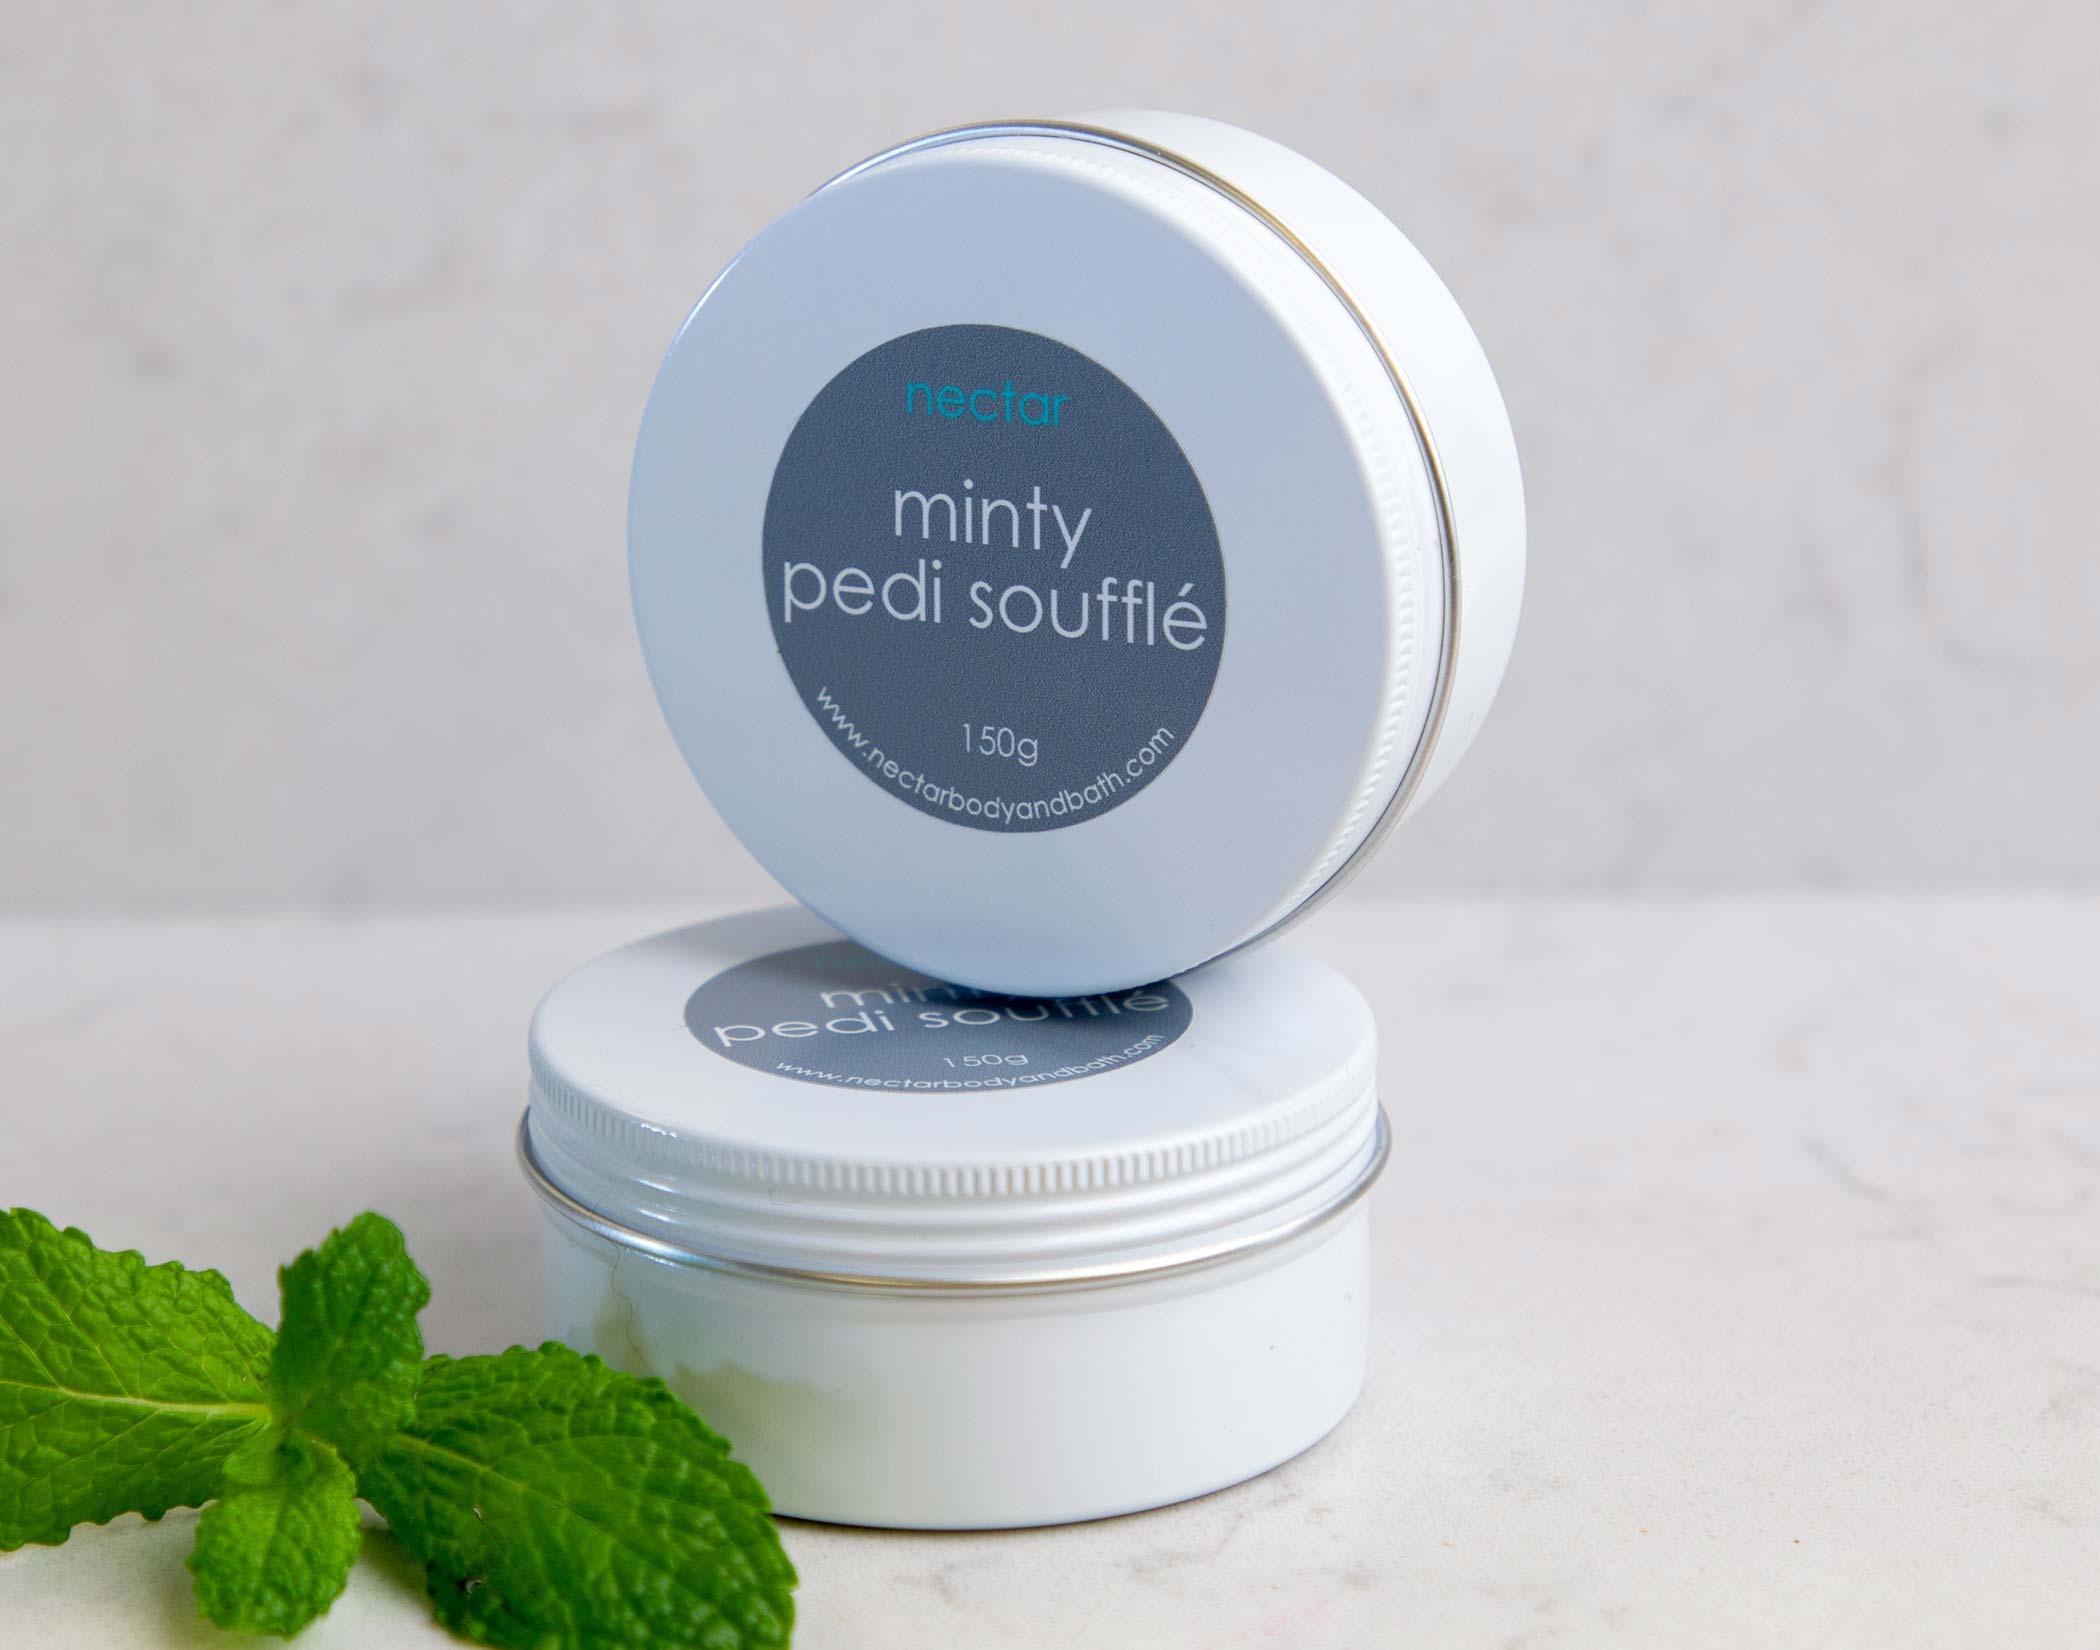 nectar-minty-pedi-souffle